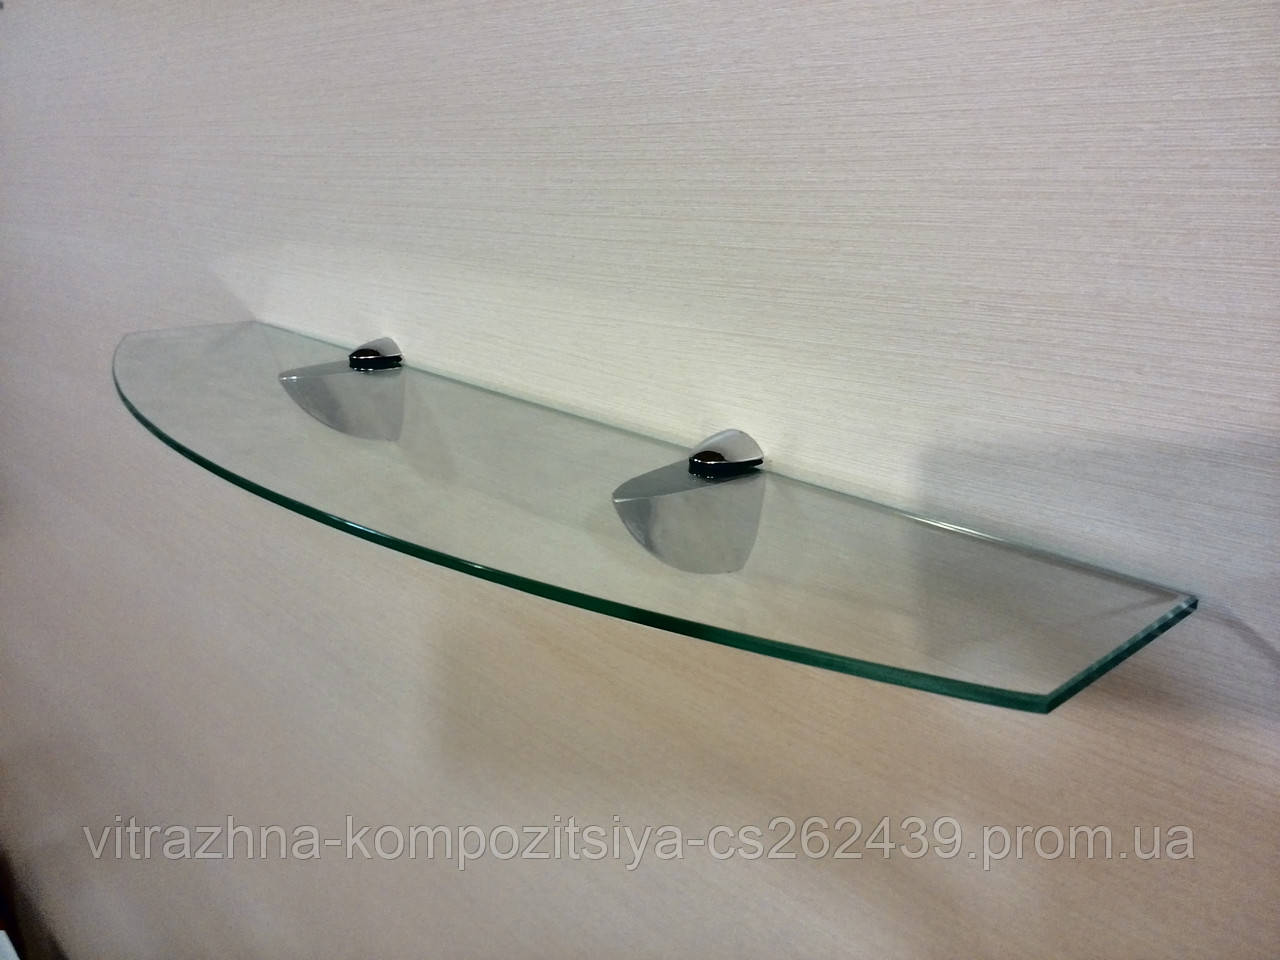 Полка стеклянная фигурная 4 мм прозрачная 50 х 12 см